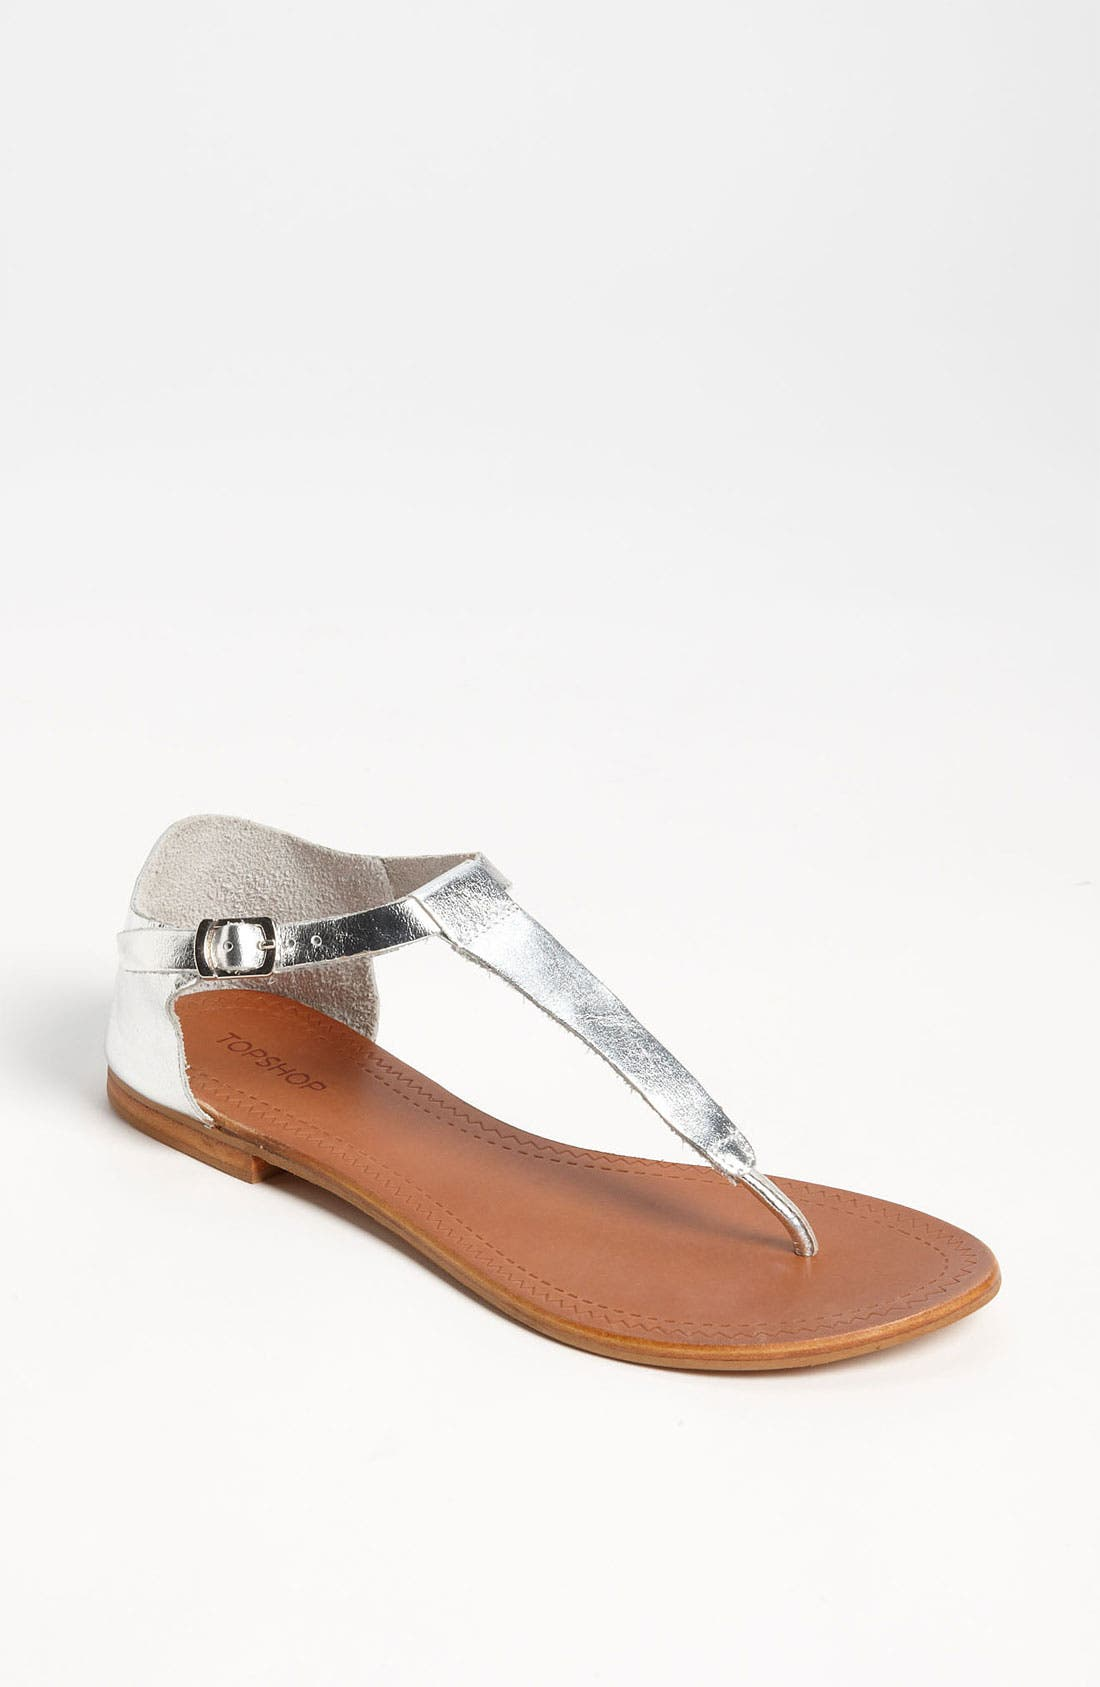 Alternate Image 1 Selected - Topshop 'Hix' Sandal